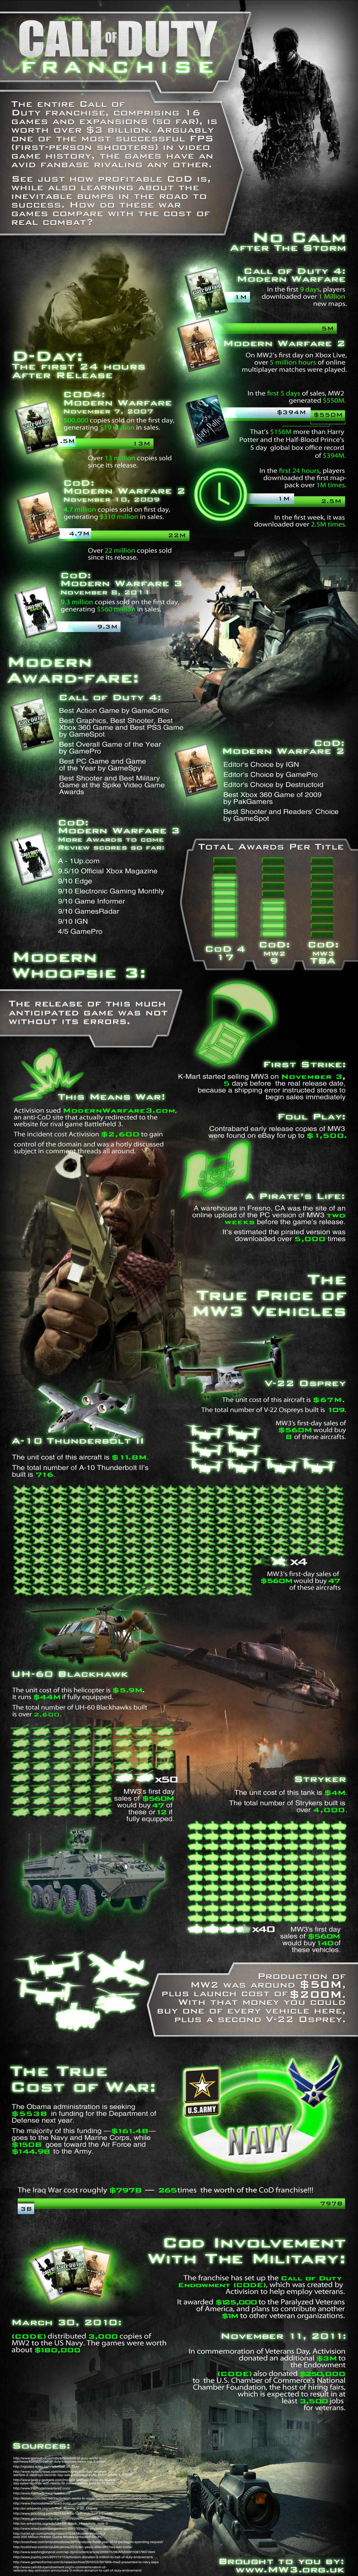 Shocking Modern Warfare 3 Infographic